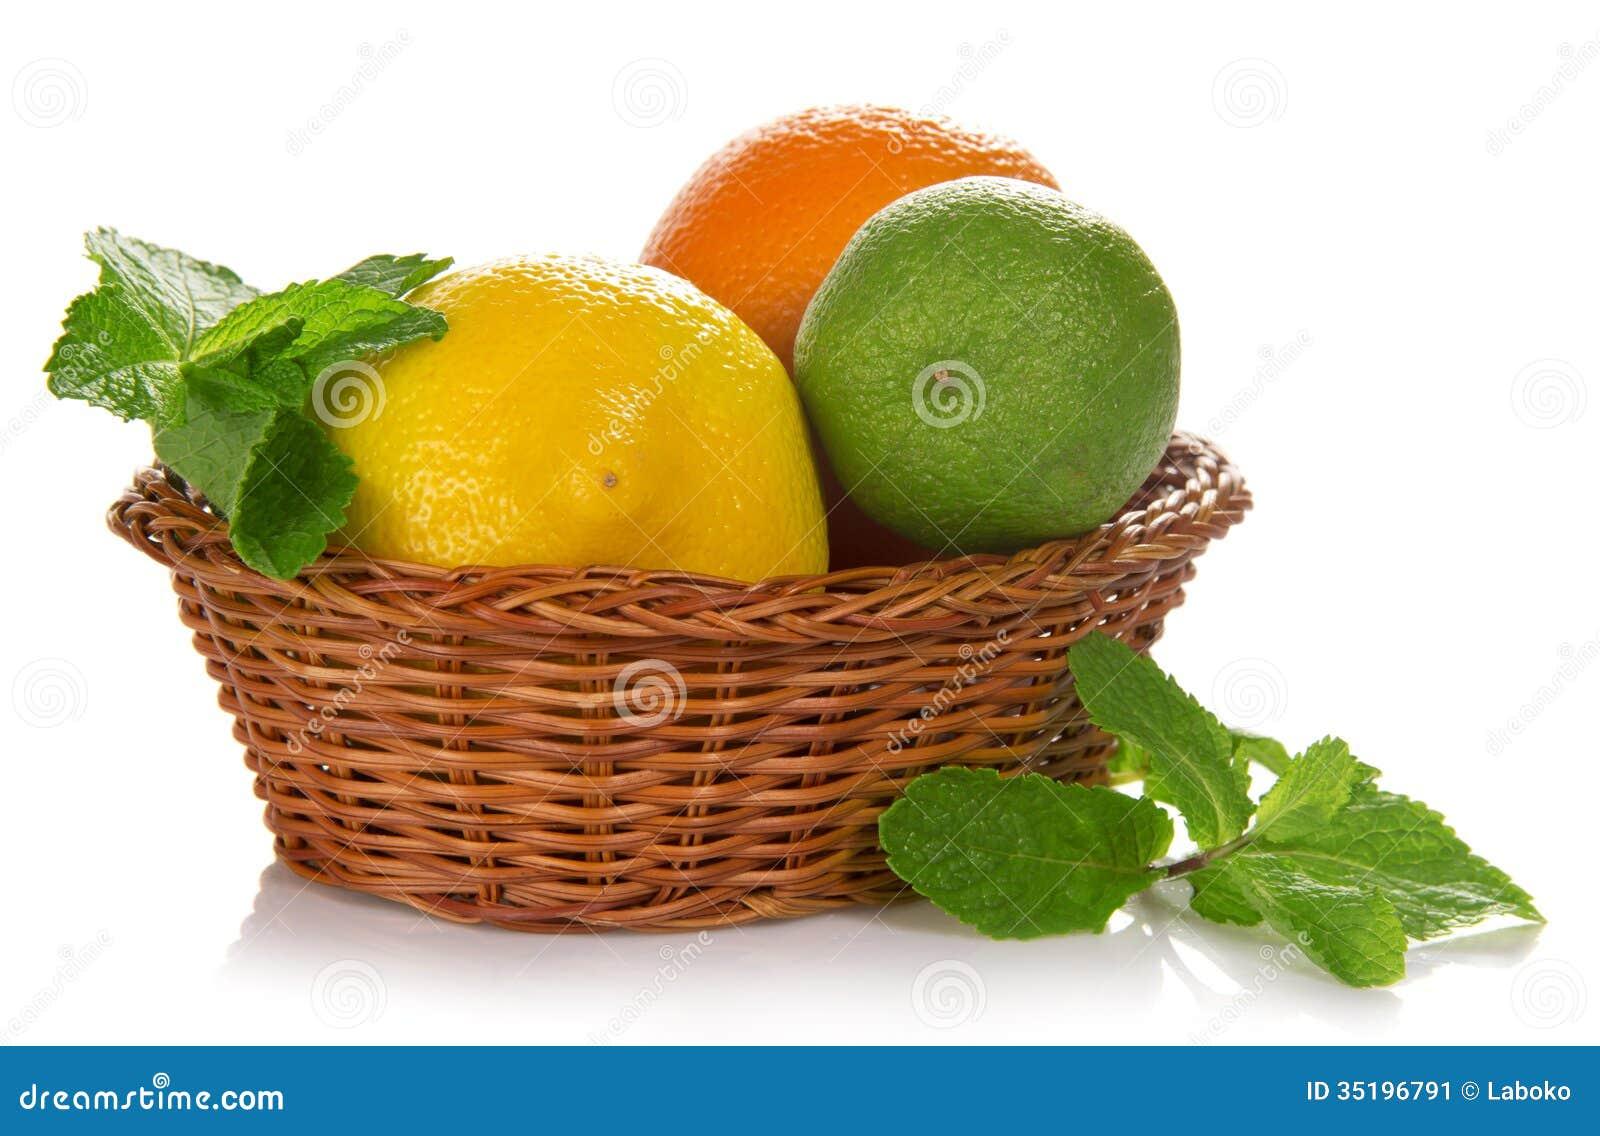 Mistaken. fruits basket lemon threesome long